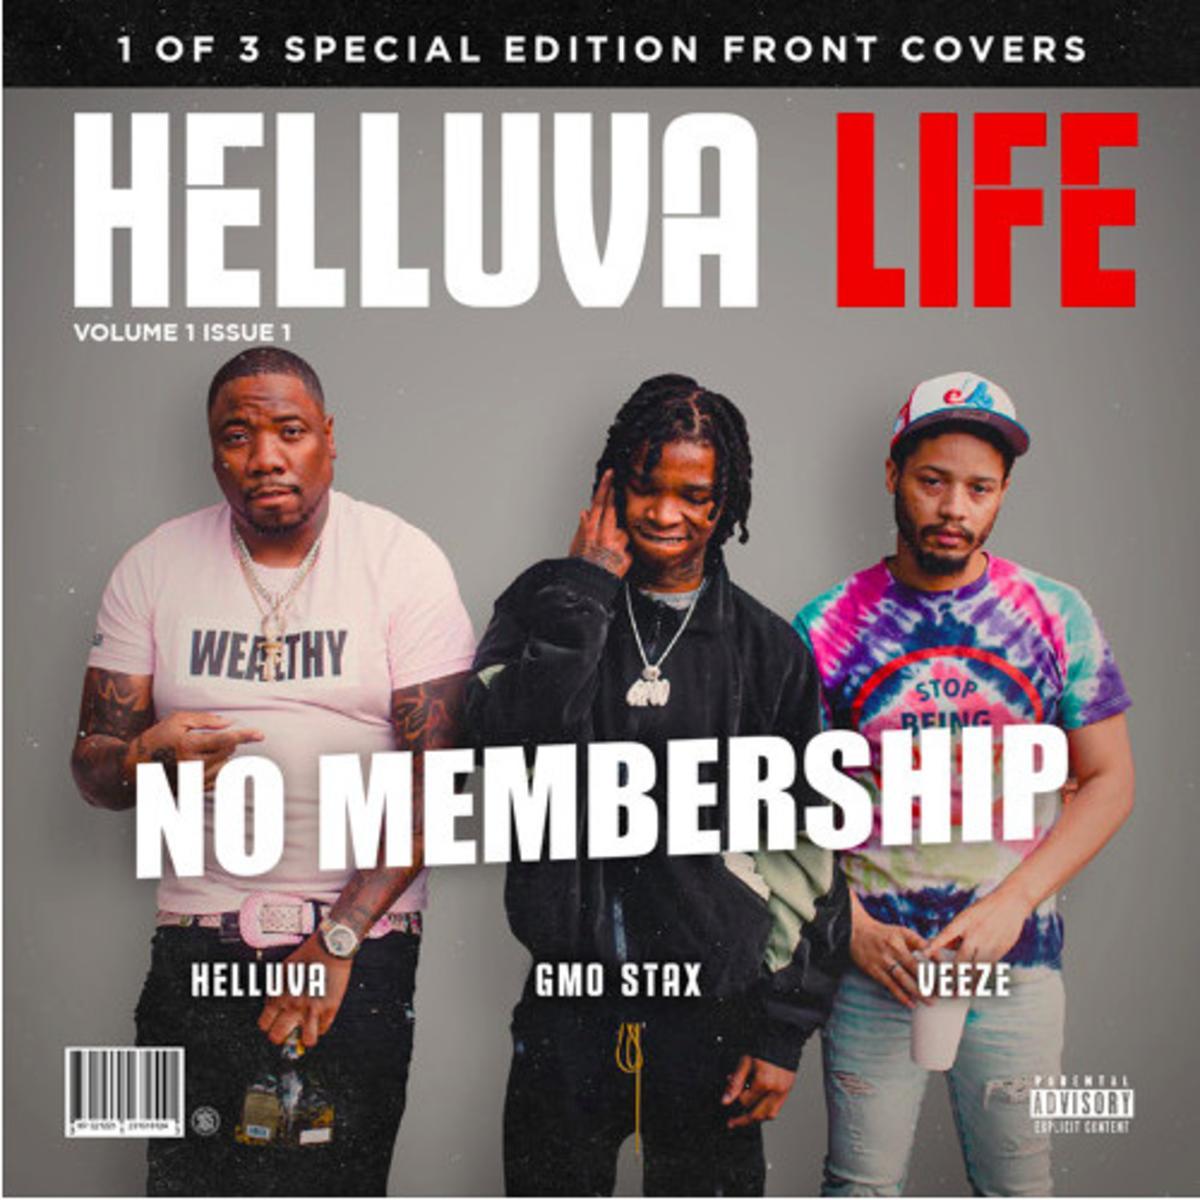 MP3: Helluva - No Membership Ft. Deeze